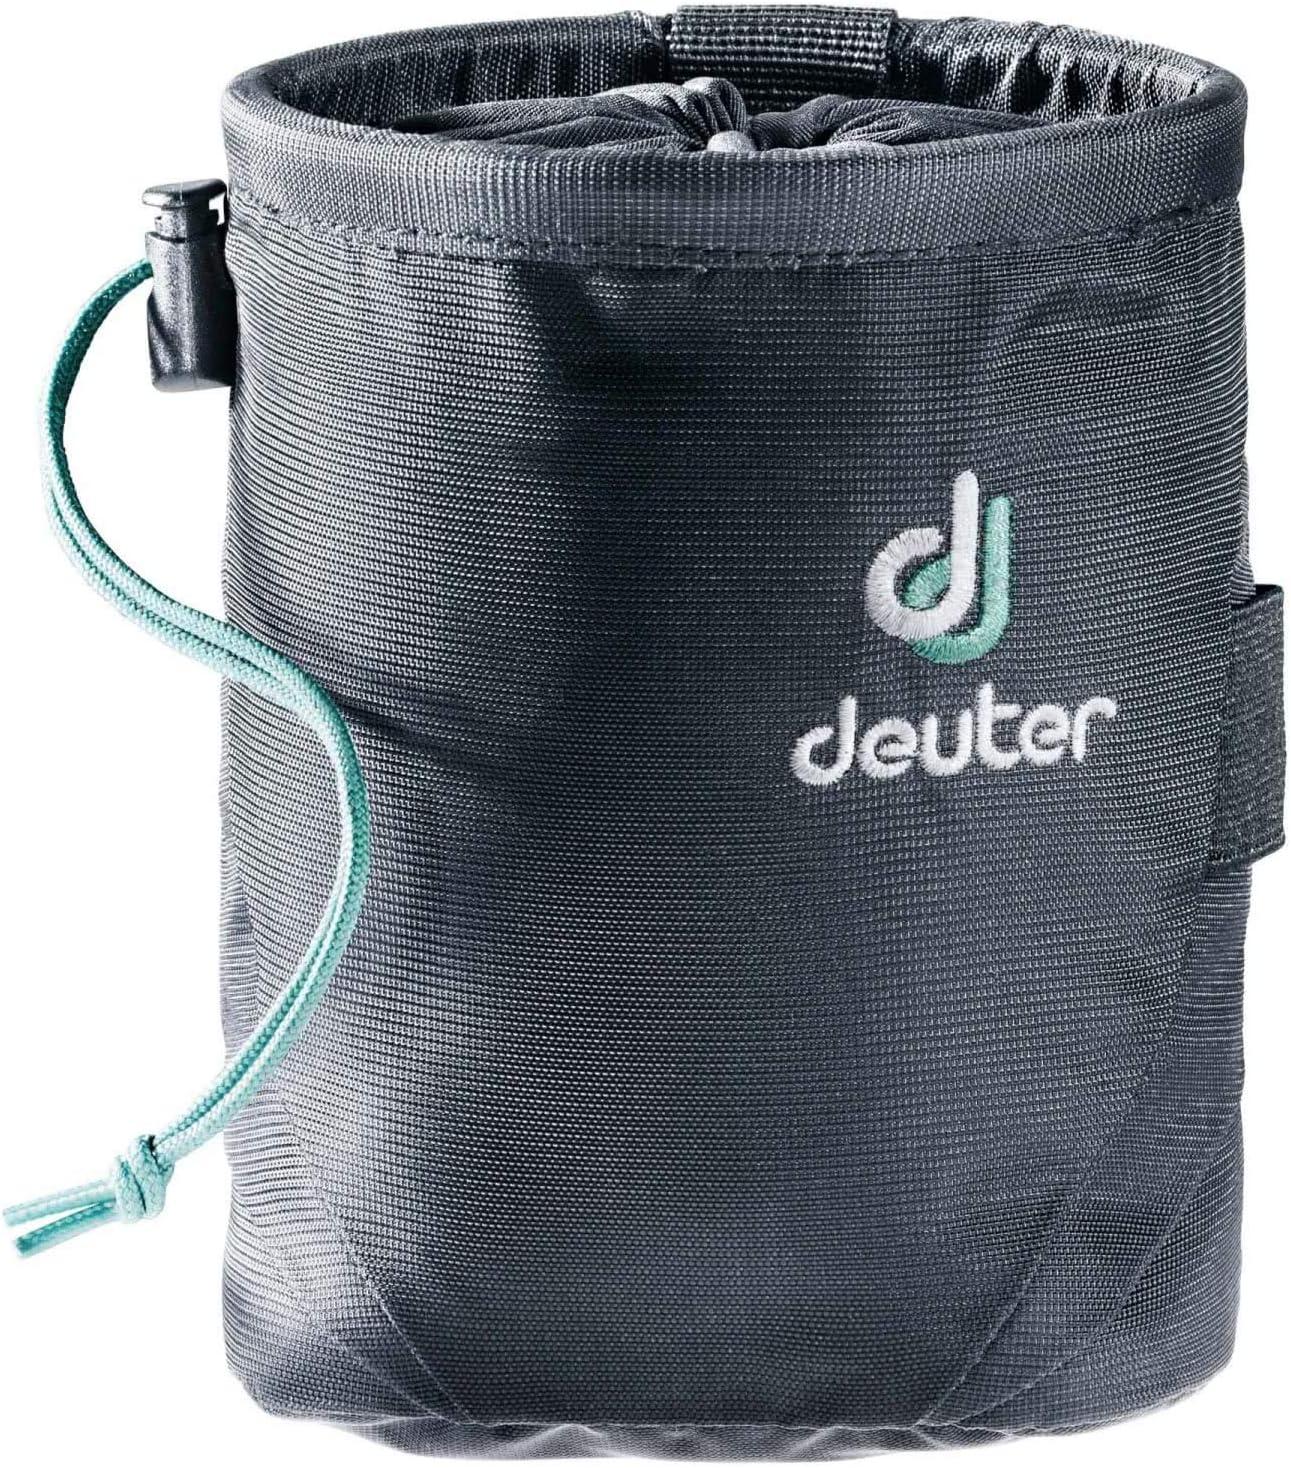 Deuter Gravity Chalk Bag IM Bolsa de Magnesio, Unisex Adulto